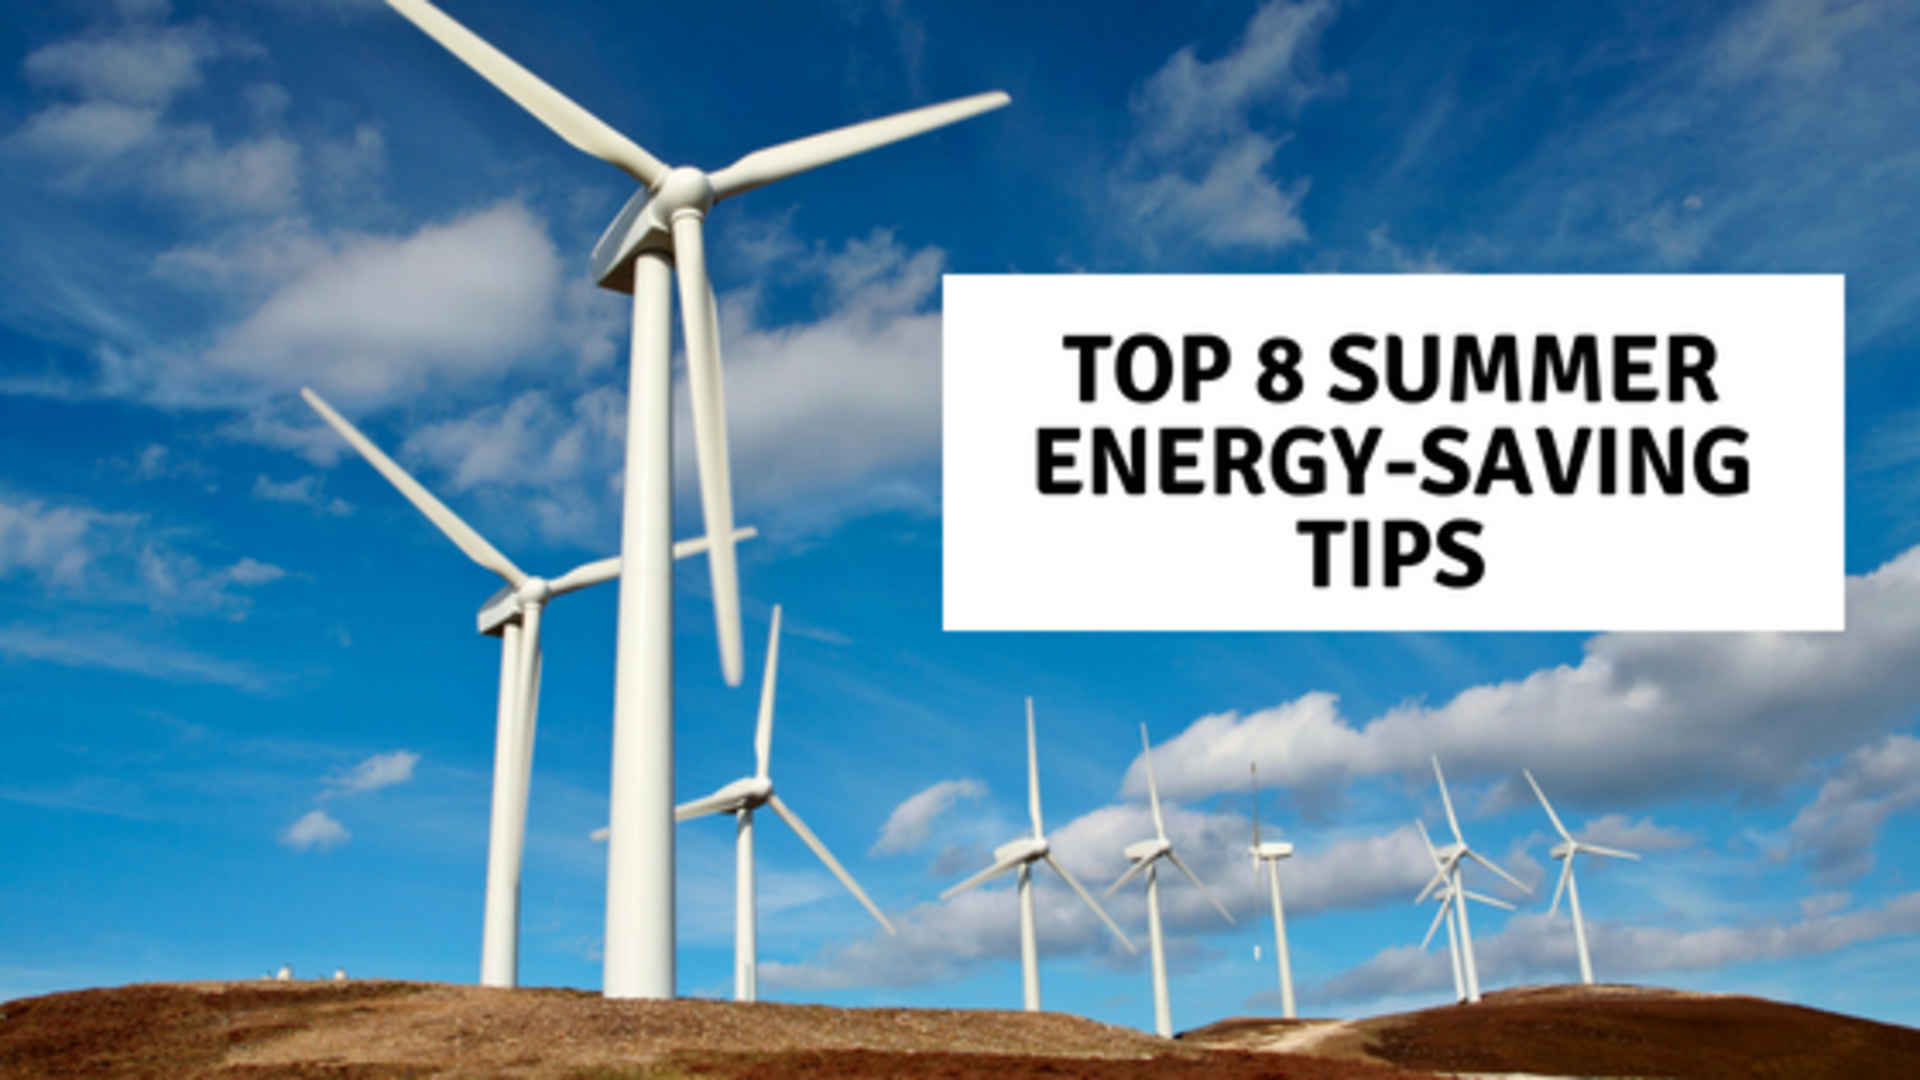 Top 8 Summer Energy-Saving Tips